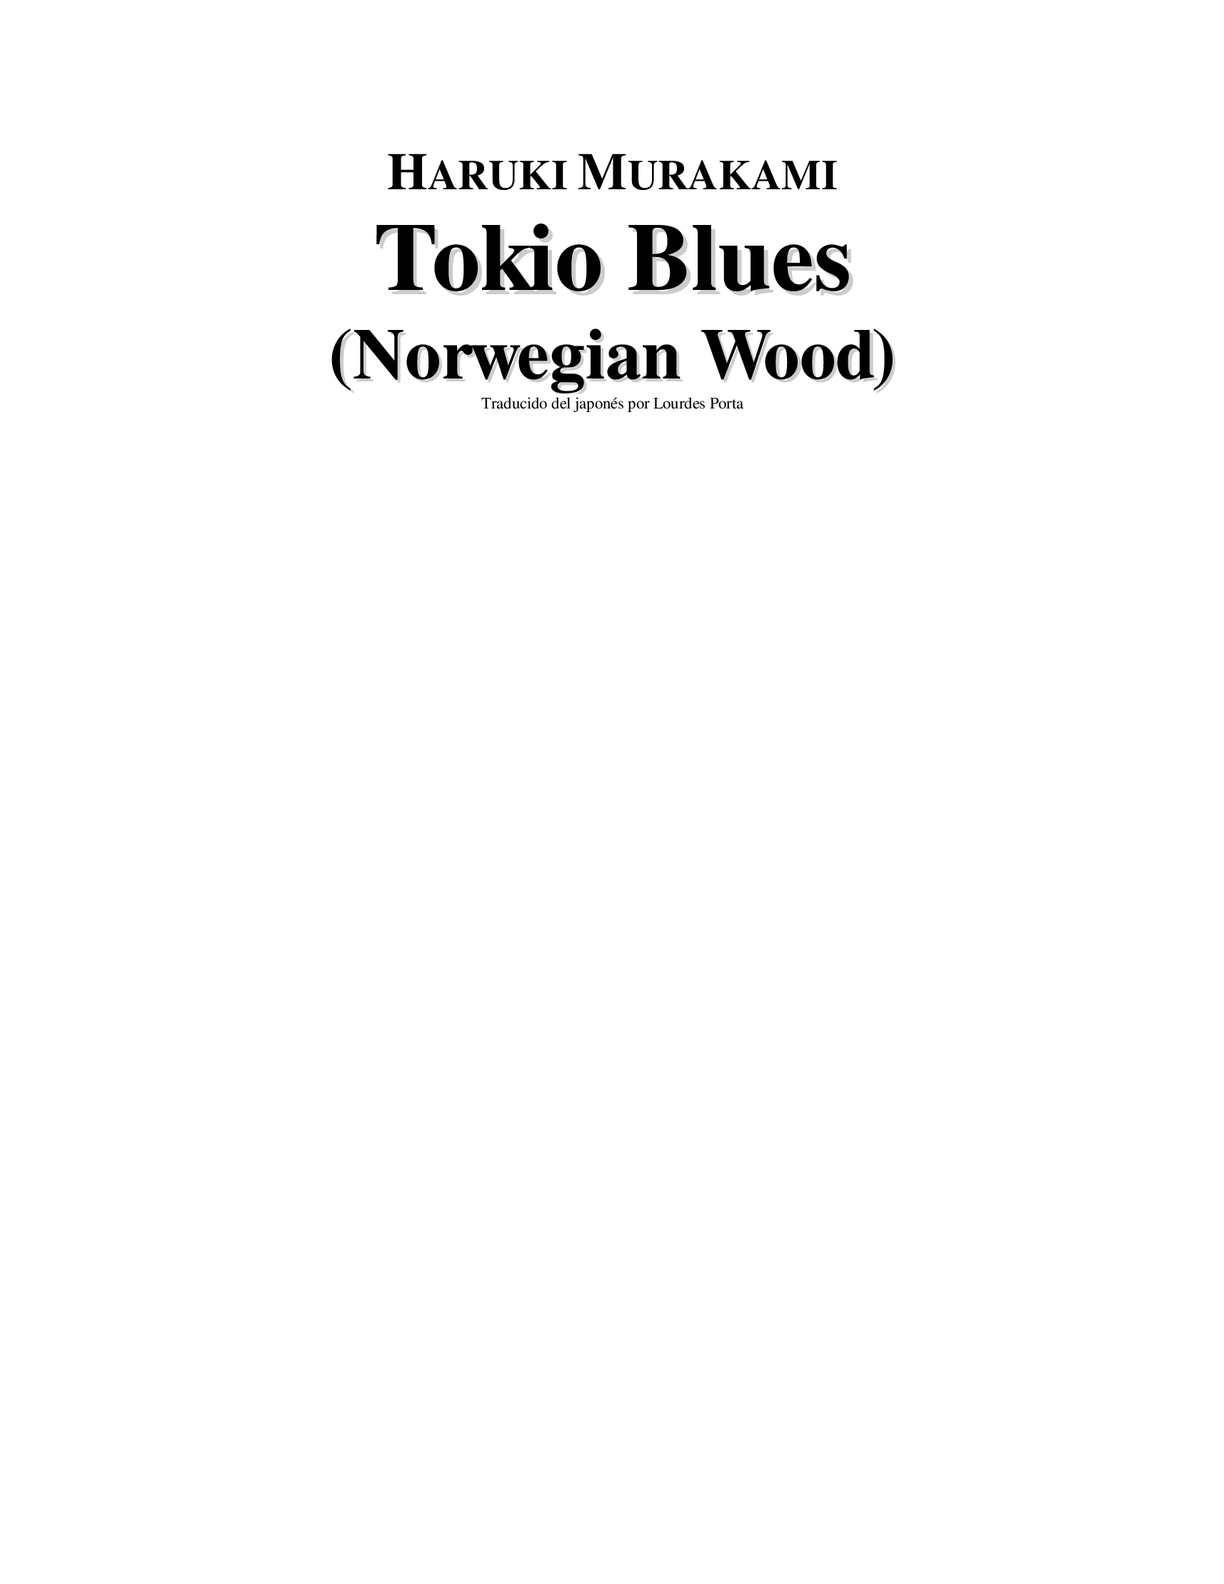 Calaméo - Haruki Murakami Tokio Blues